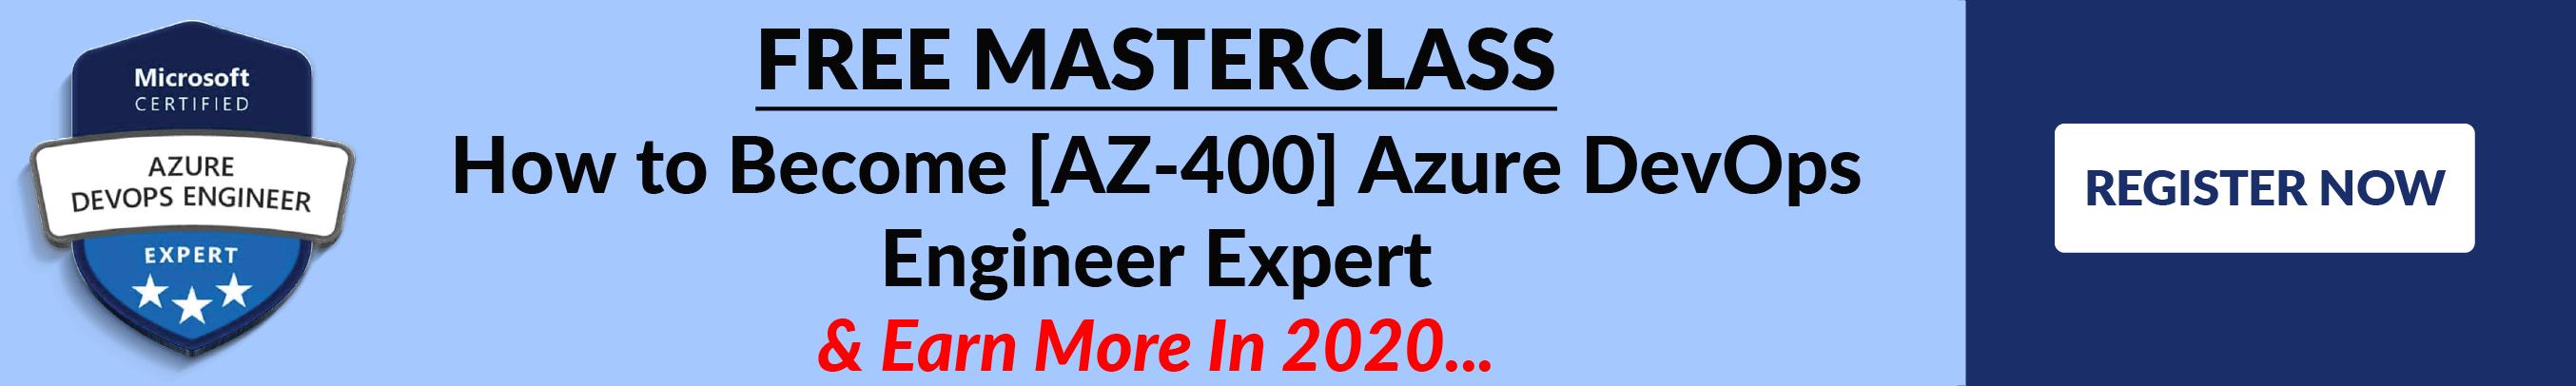 Free Masterclass AZ-400